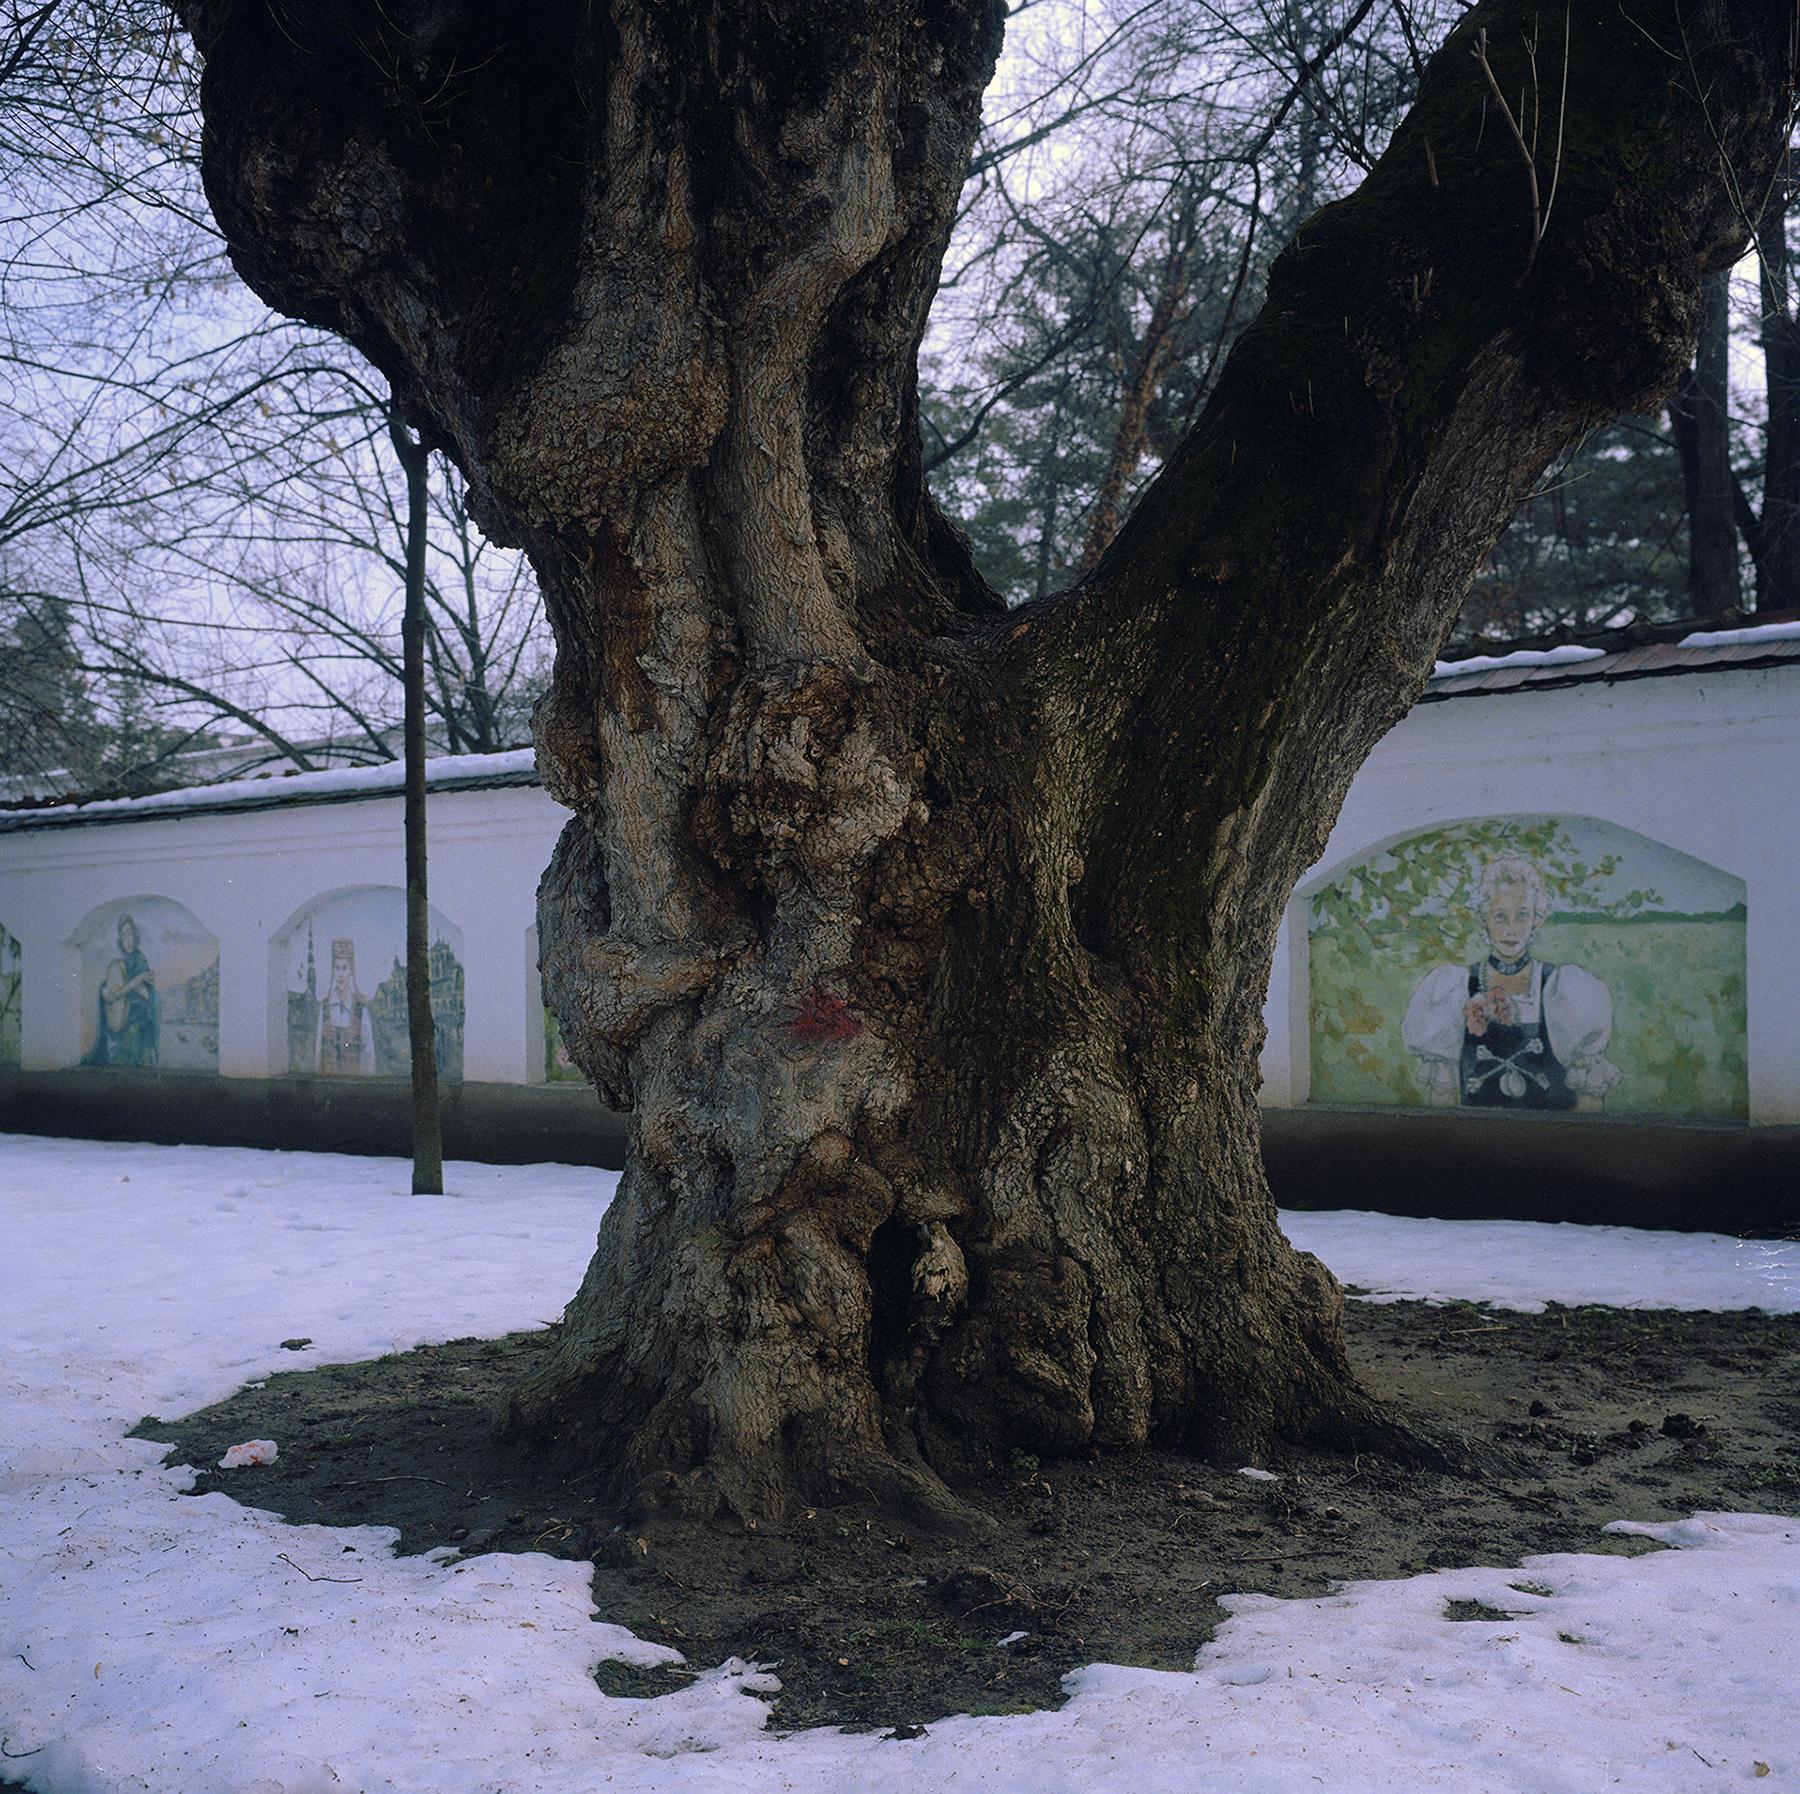 Annemarie_Bala_Europa_Park_tree.jpg